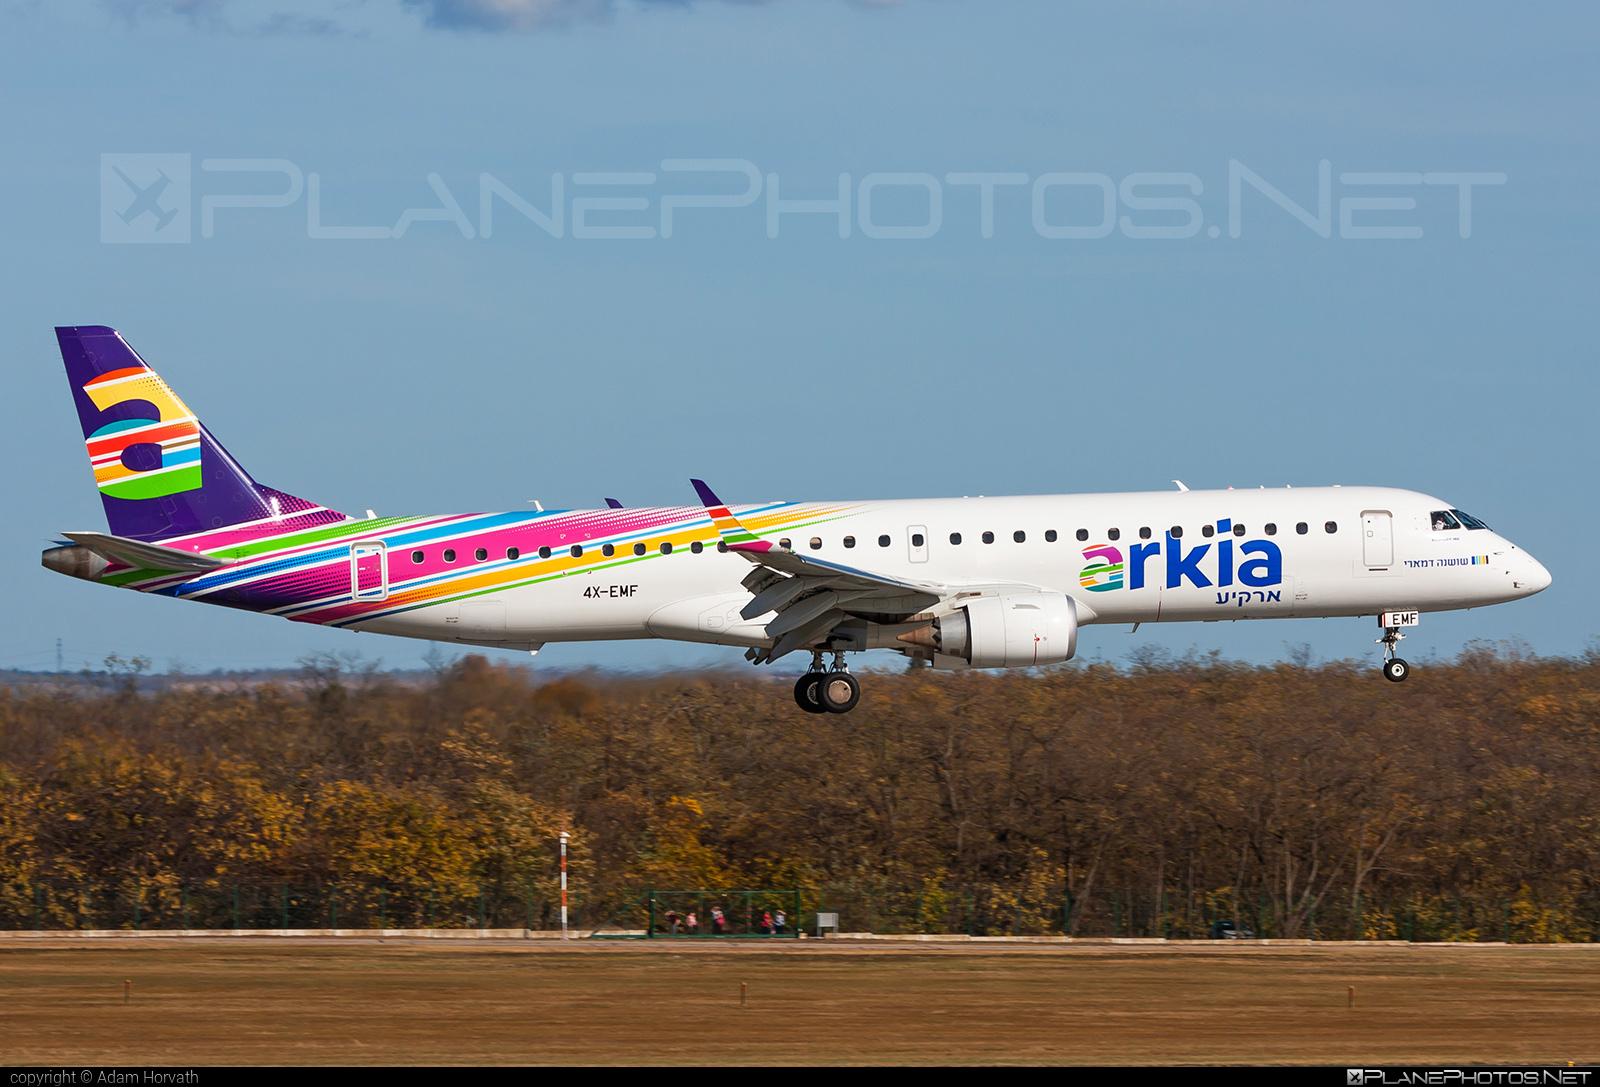 Embraer E195IGW (ERJ-190-200IGW) - 4X-EMF operated by Arkia Israeli Airlines #e190 #e190200 #e190200igw #e195igw #embraer #embraer190200igw #embraer195 #embraer195igw